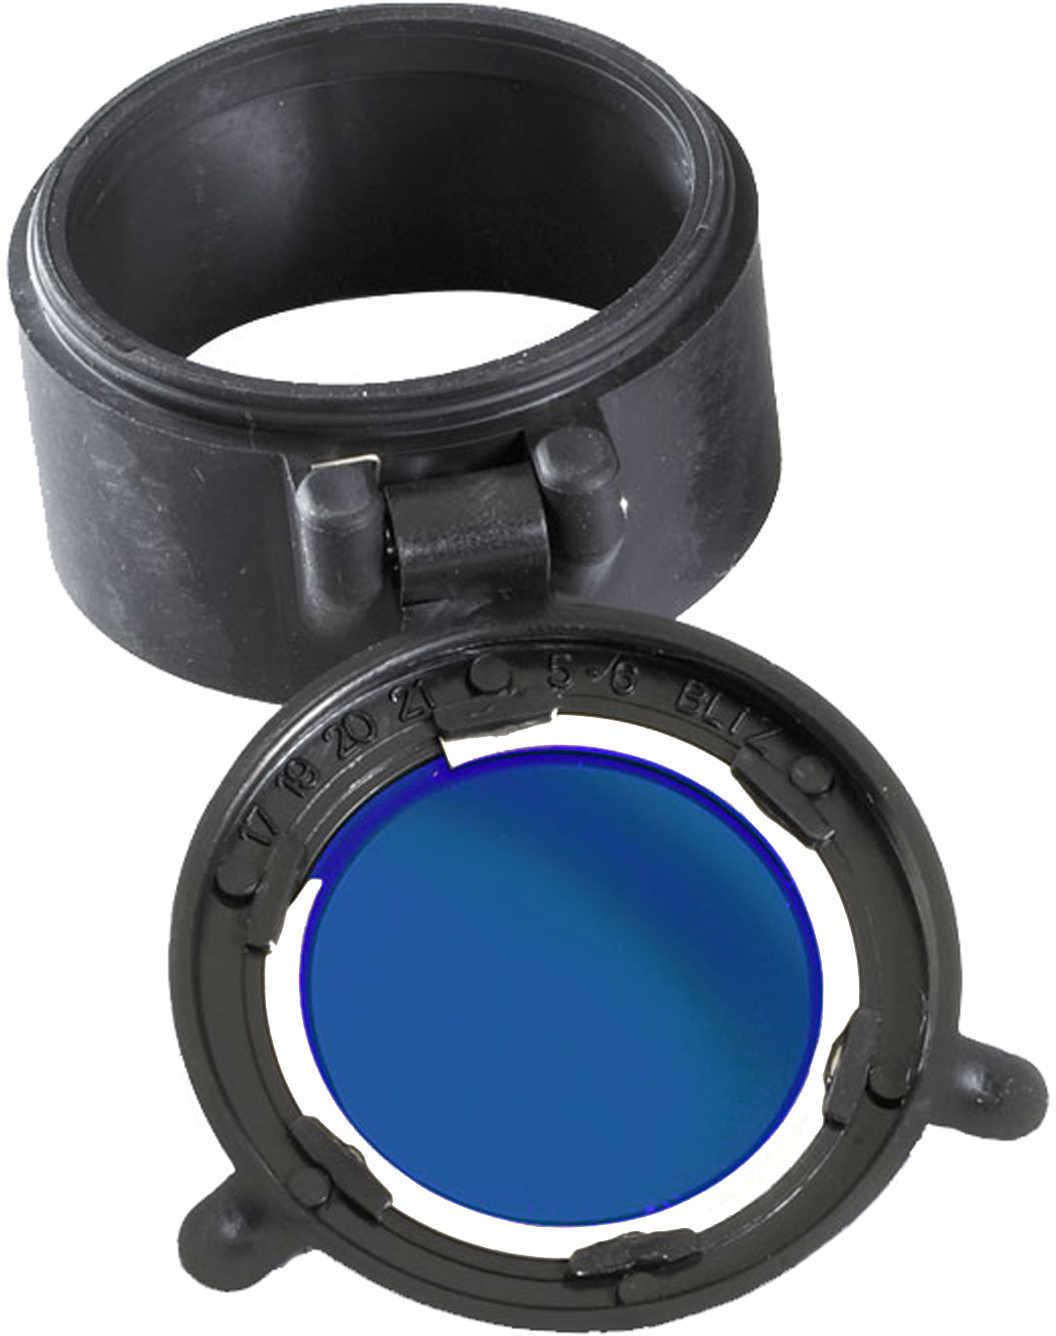 Streamlight Tl Series Accessory Blue Md: 75116